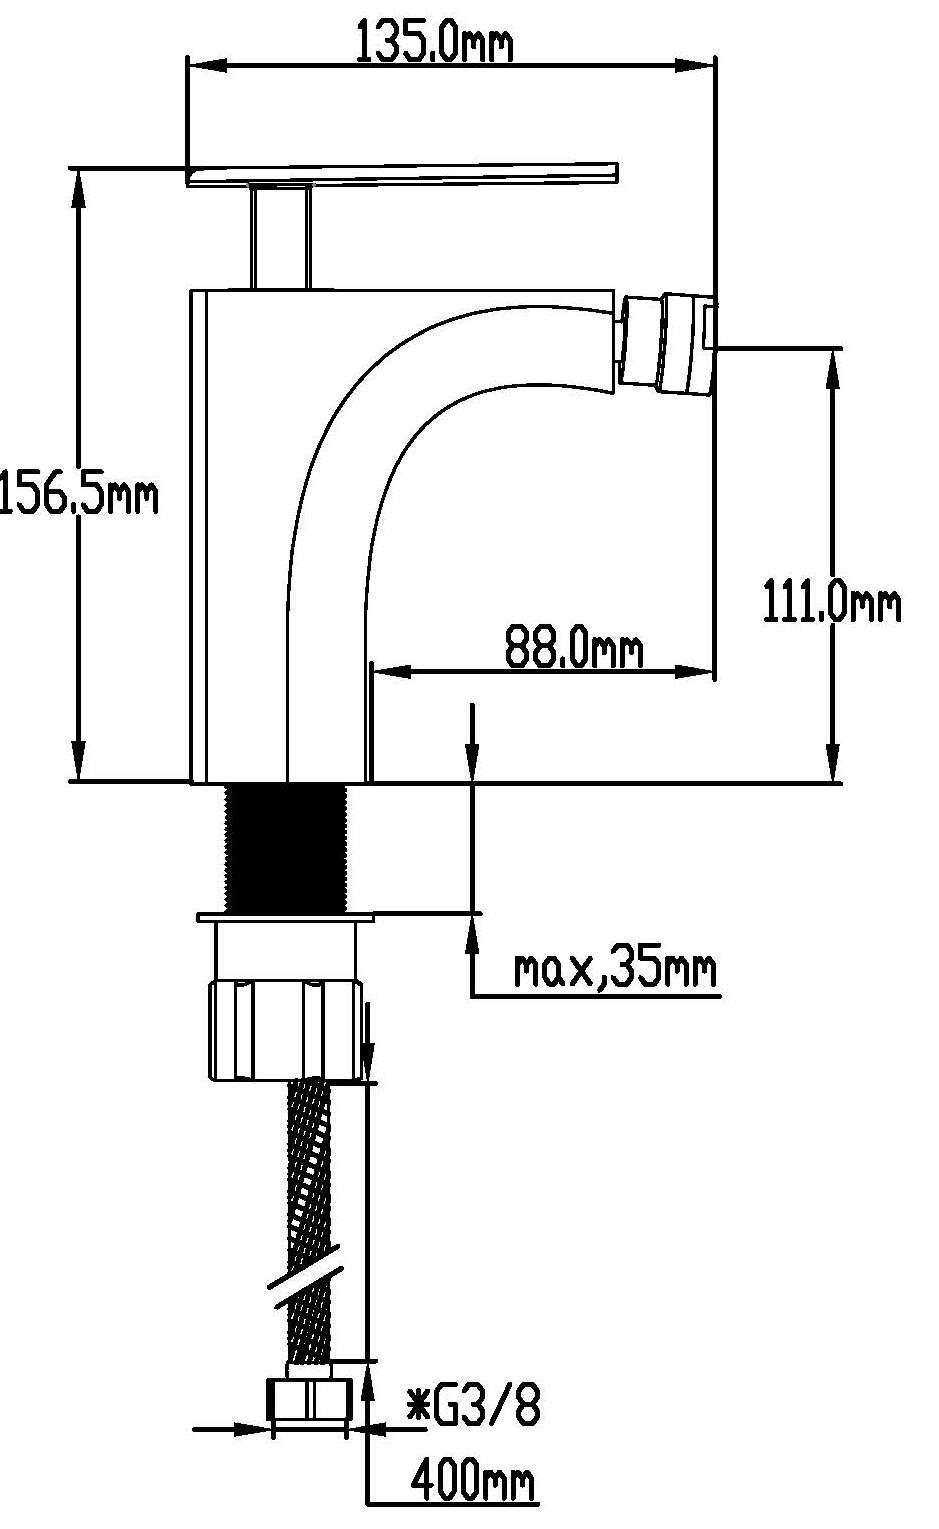 DP Bath SNO-0002''Nogal'' Bidet Mixer Tap - Chrome by DP Bath